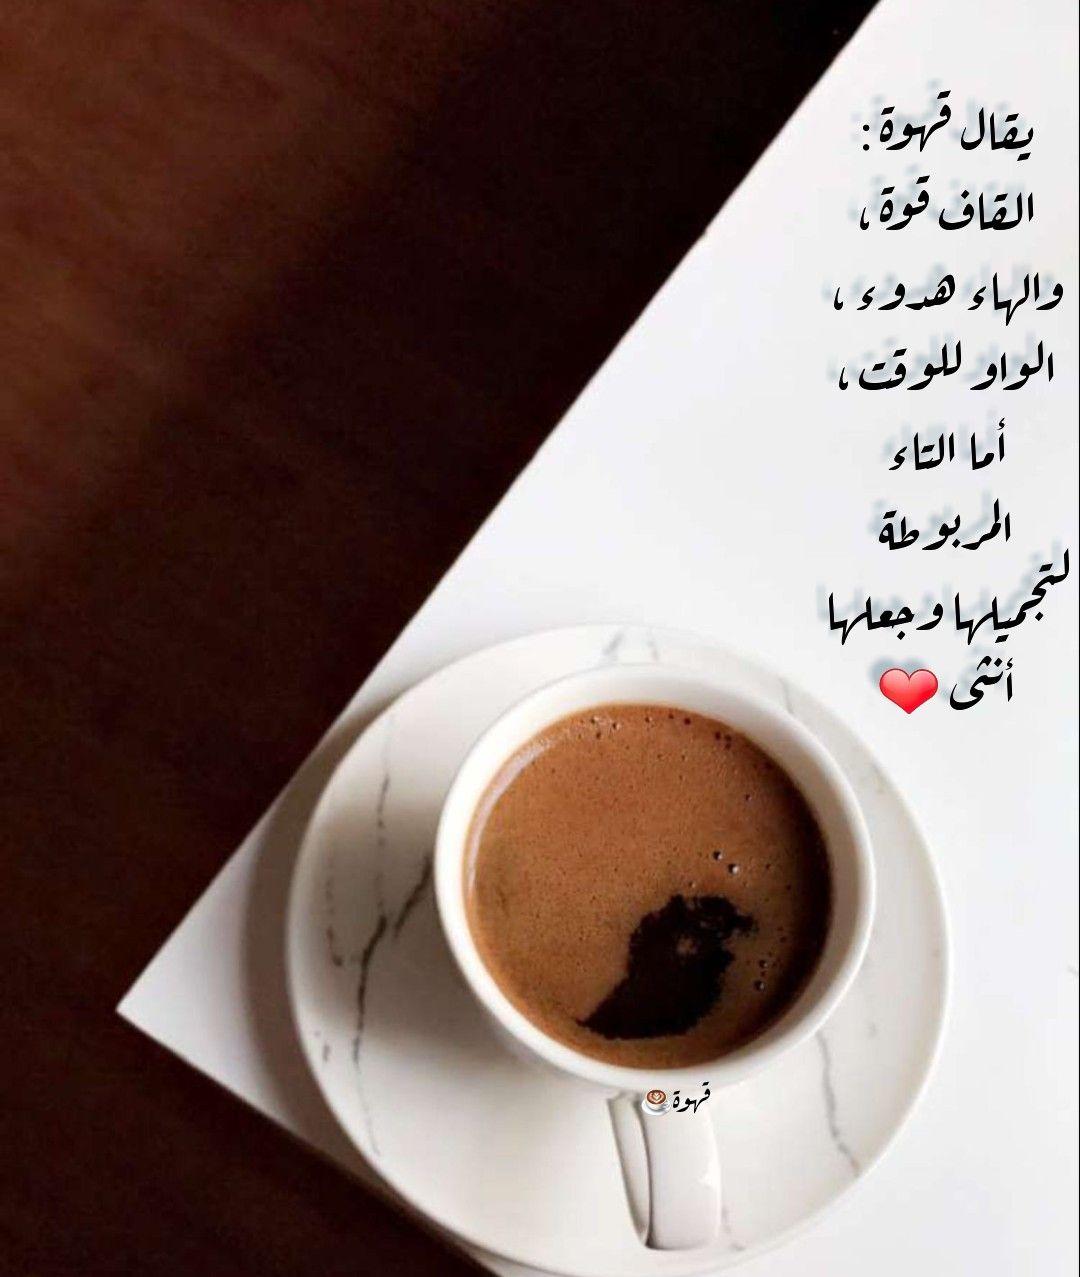 Coffee Quotes Picقهوة اقتباسات صور Coffee Latte Art Coffee Quotes Coffee Latte